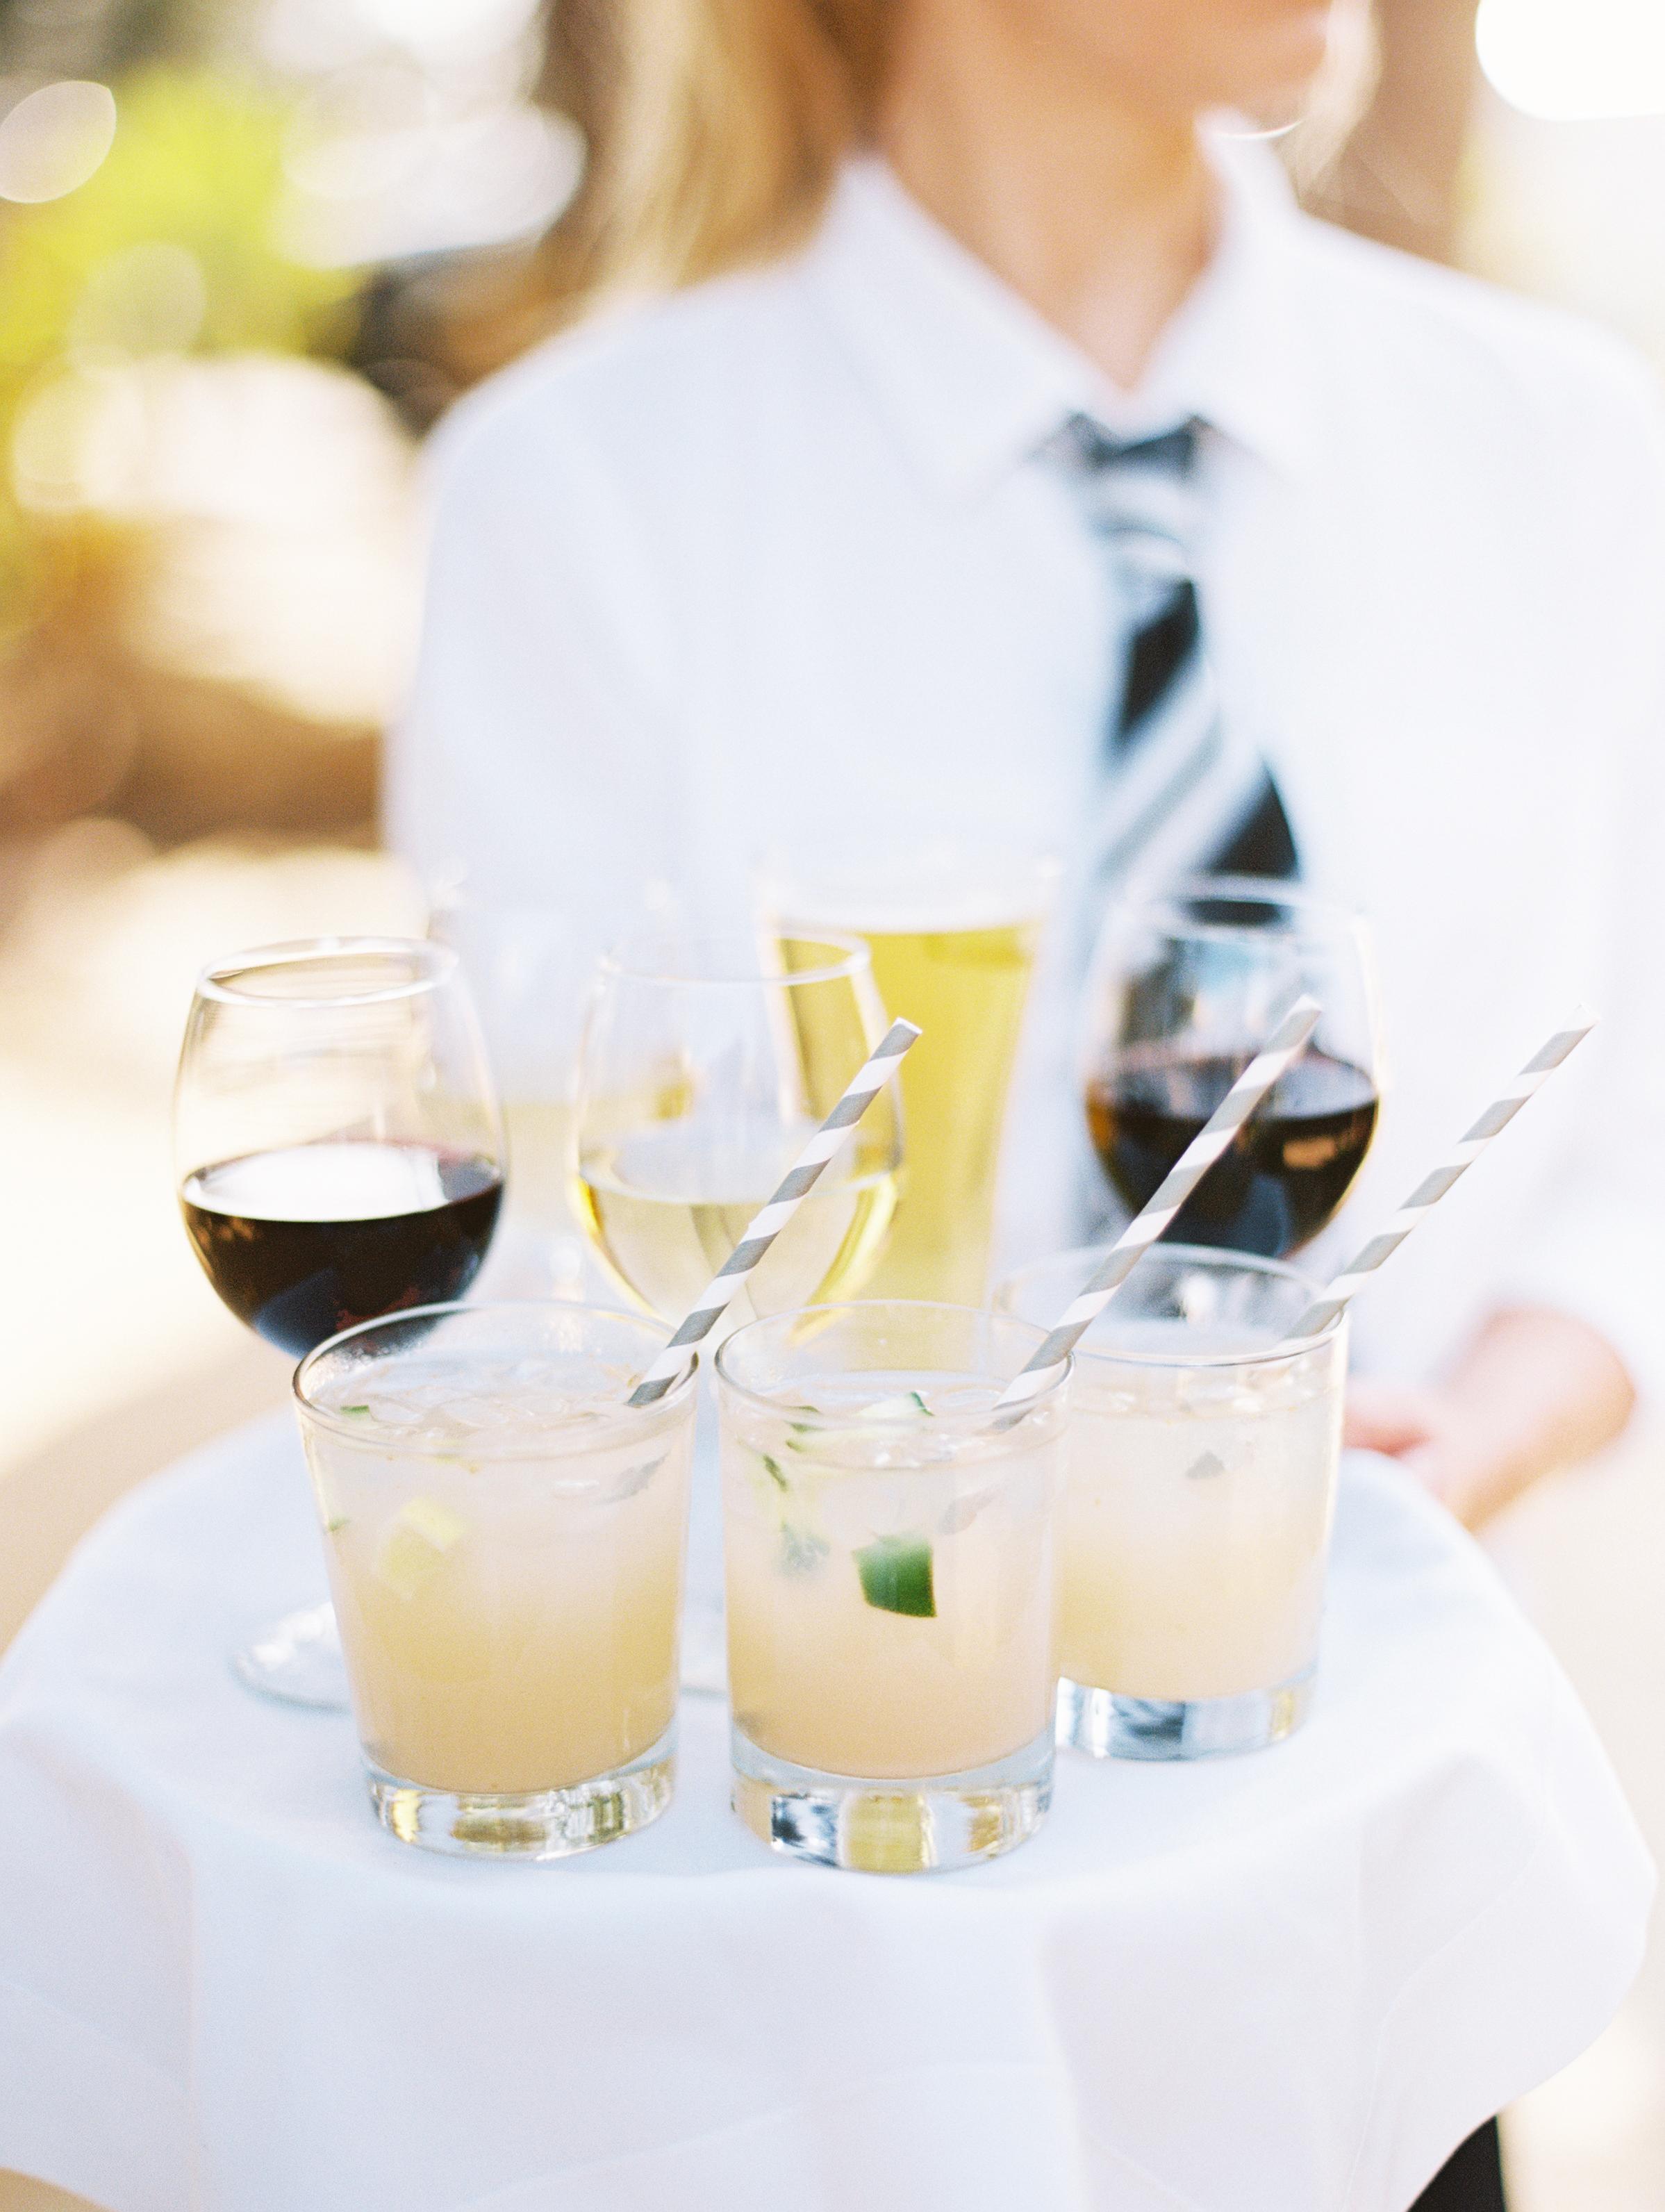 www.santabarbarawedding.com | Pat Moyer Wedding Photography & Films | Santa Barbara Historical Museum | Magnolia Weddings | Camiella Floral Designs | Signature Drink